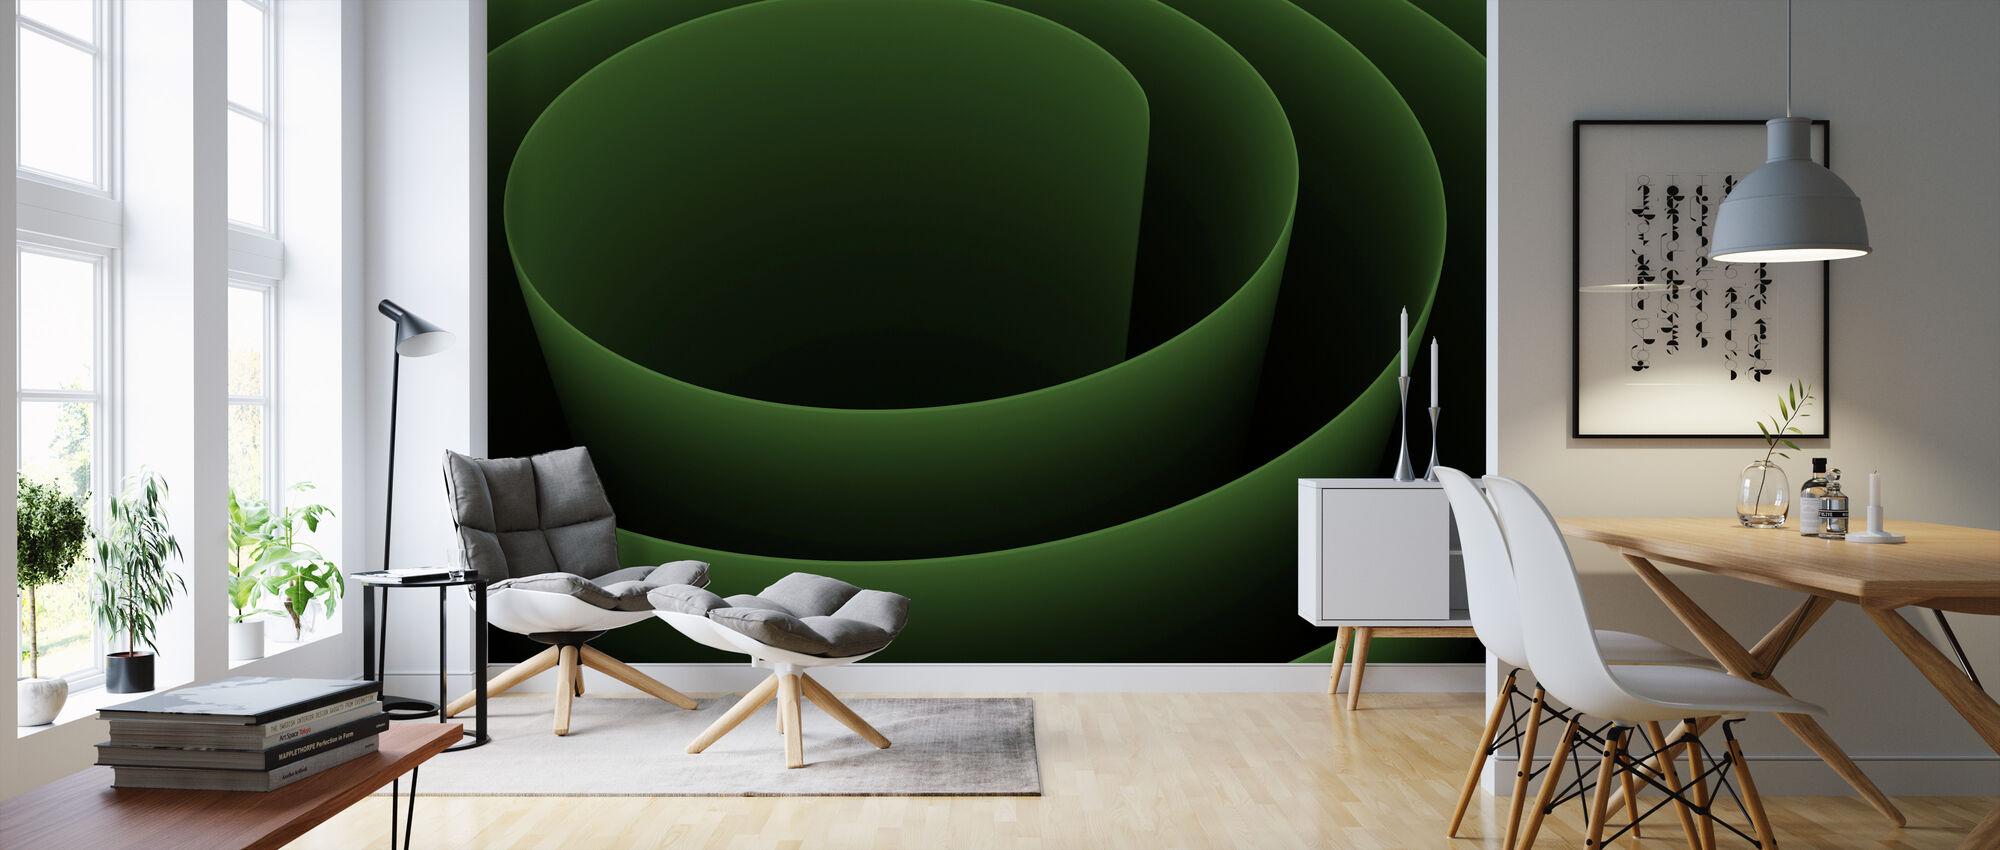 Abstract 3D Spiral - Wallpaper - Living Room